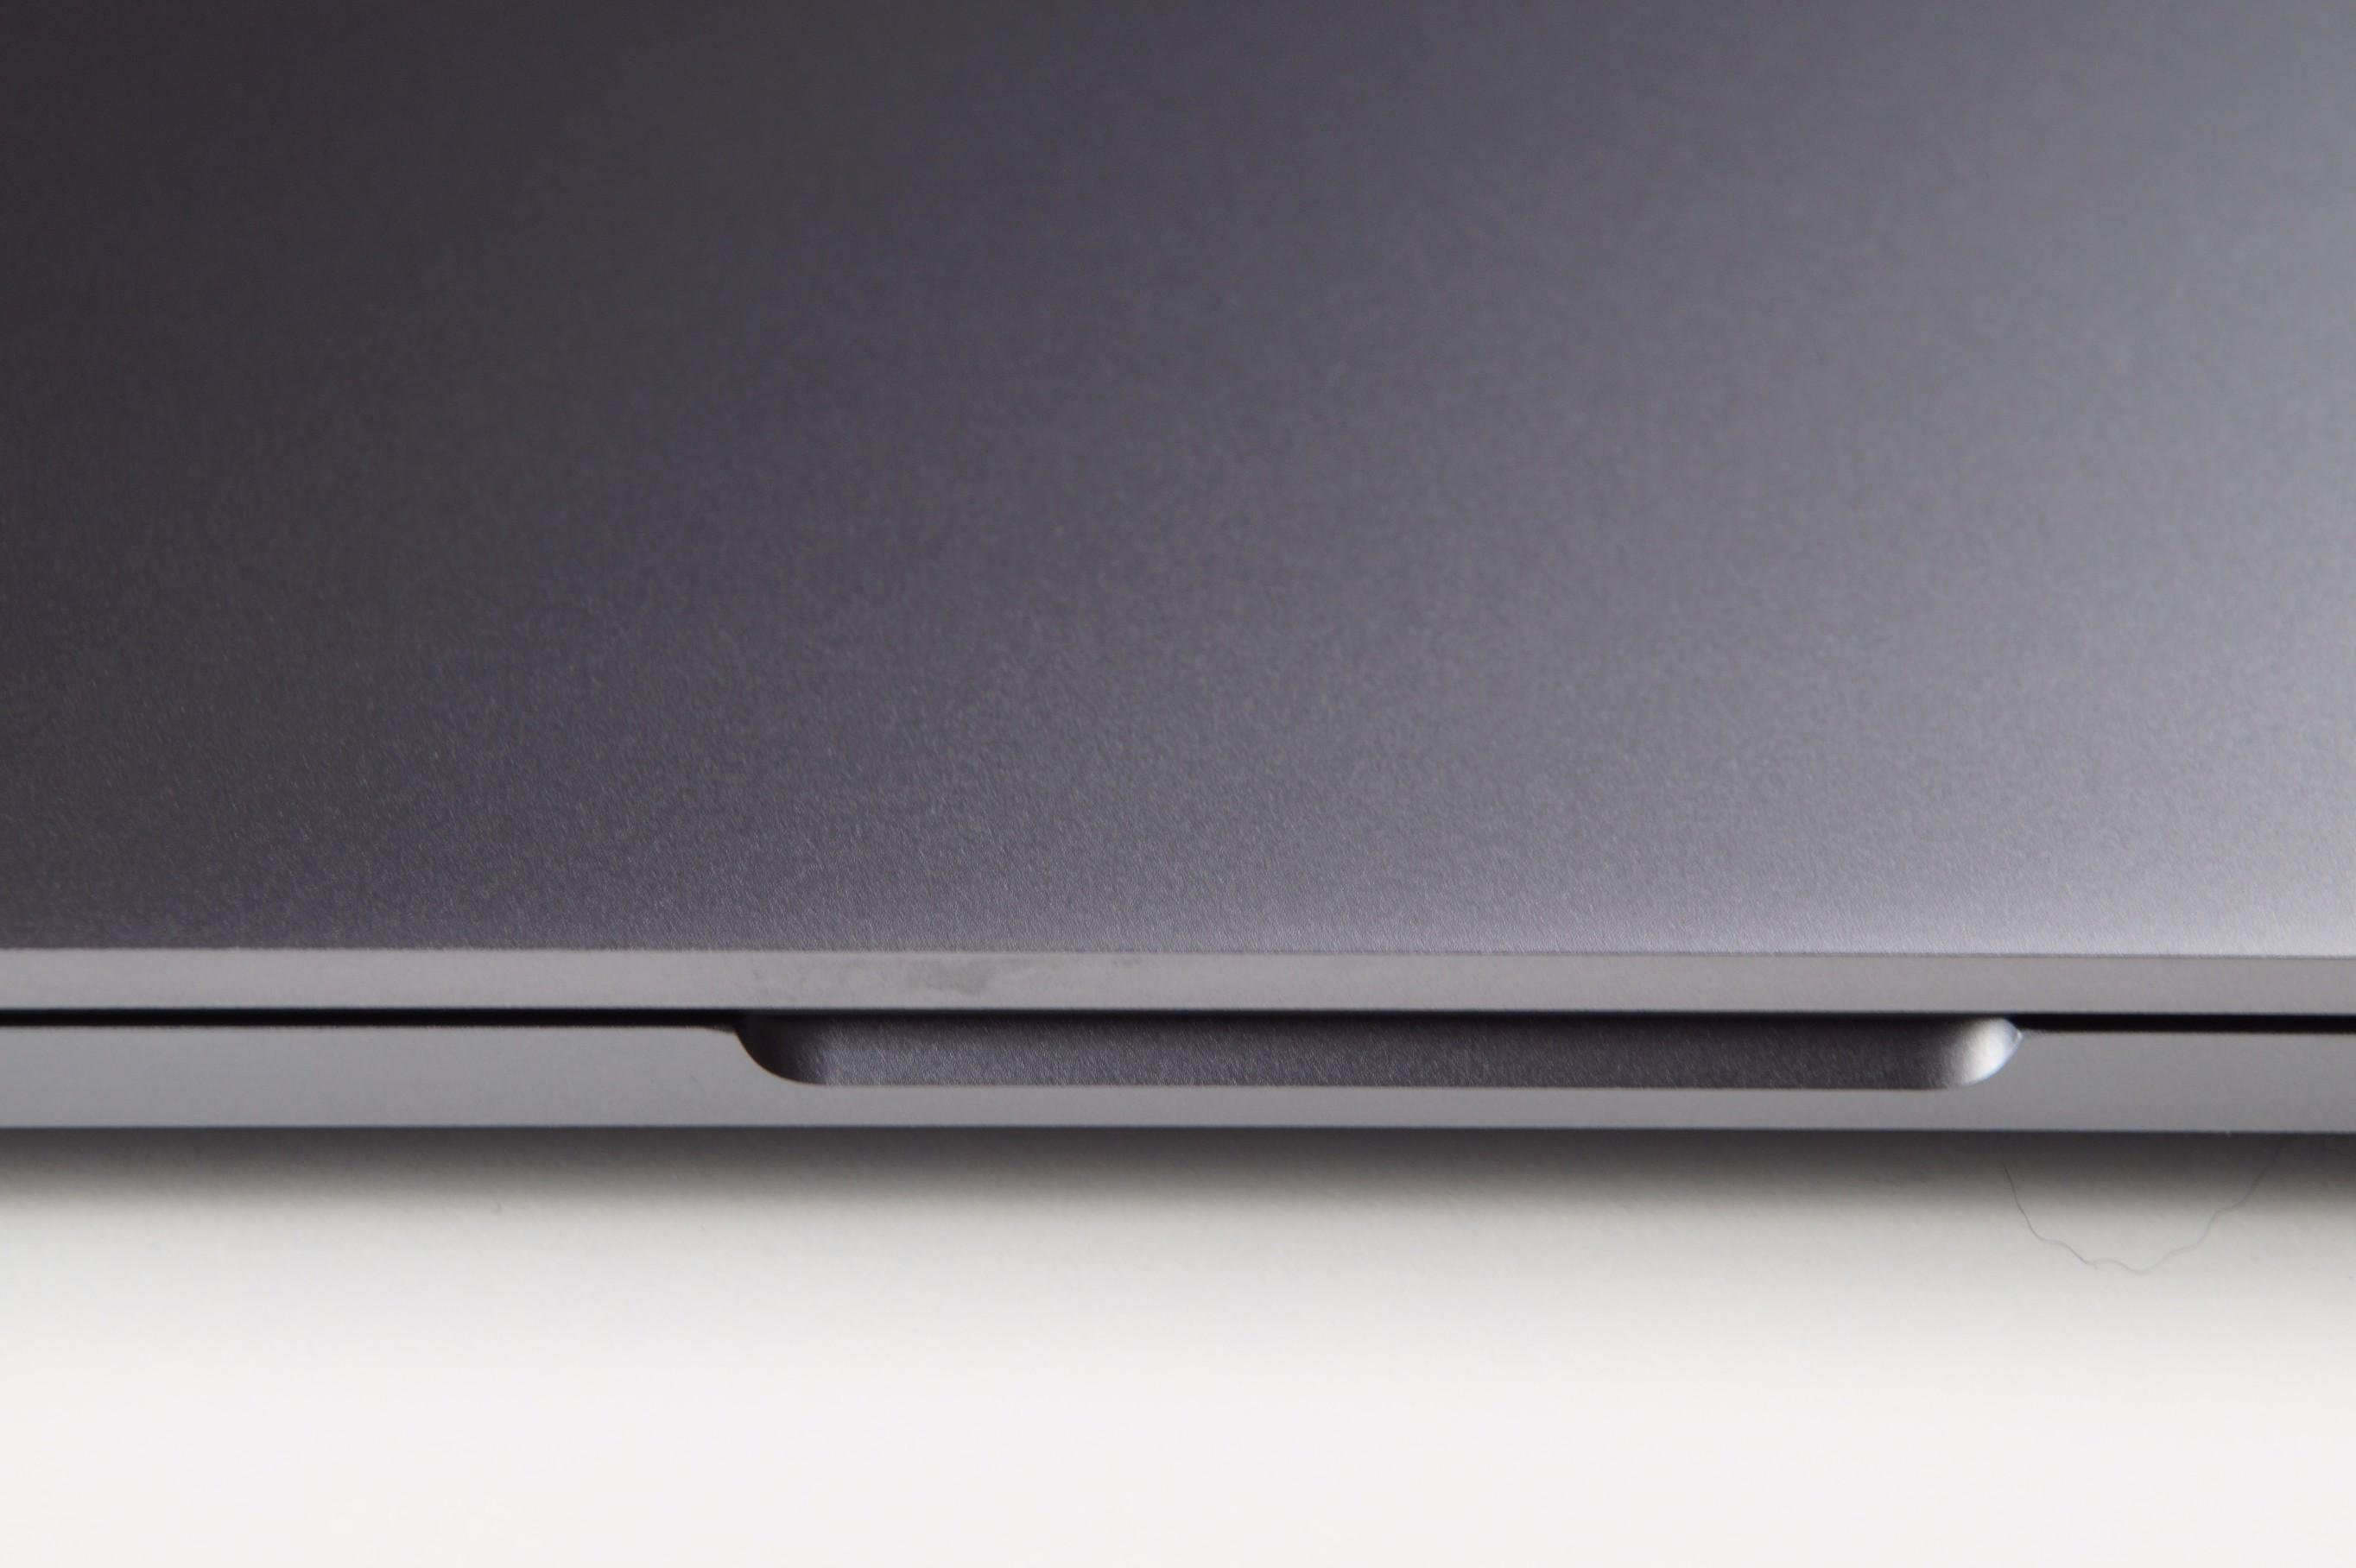 Xiaomi Mi Notebook Pro 1 8